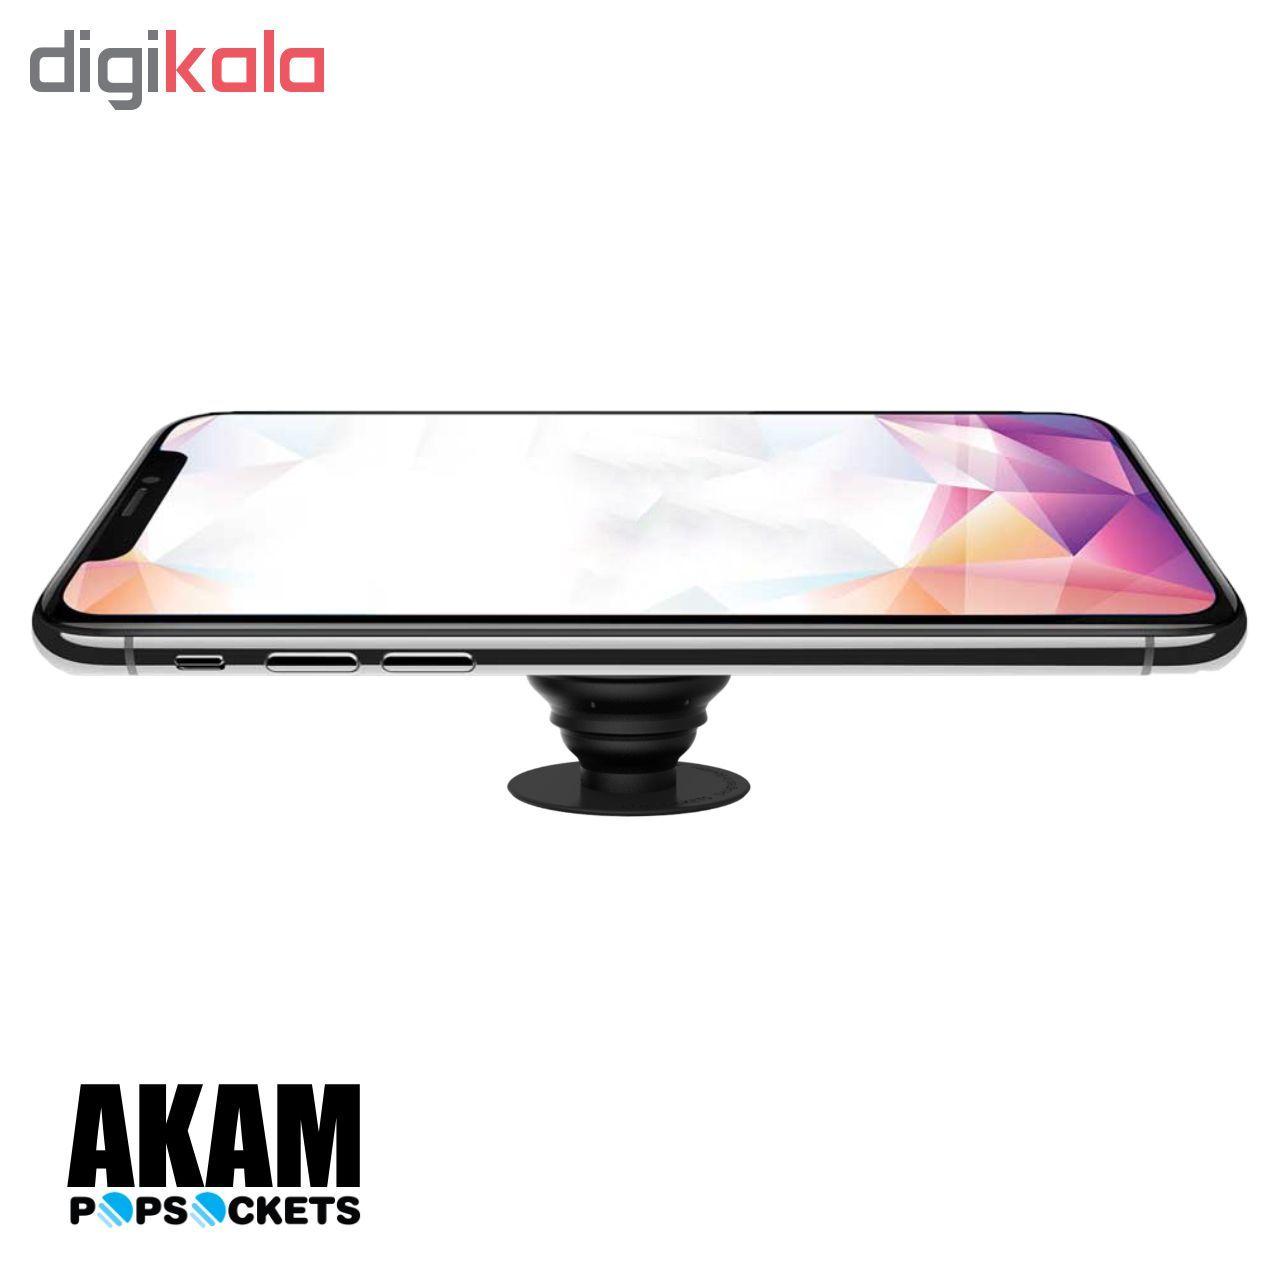 پایه نگهدارنده گوشی موبایل پاپ سوکت آکام مدل APS0078 main 1 10